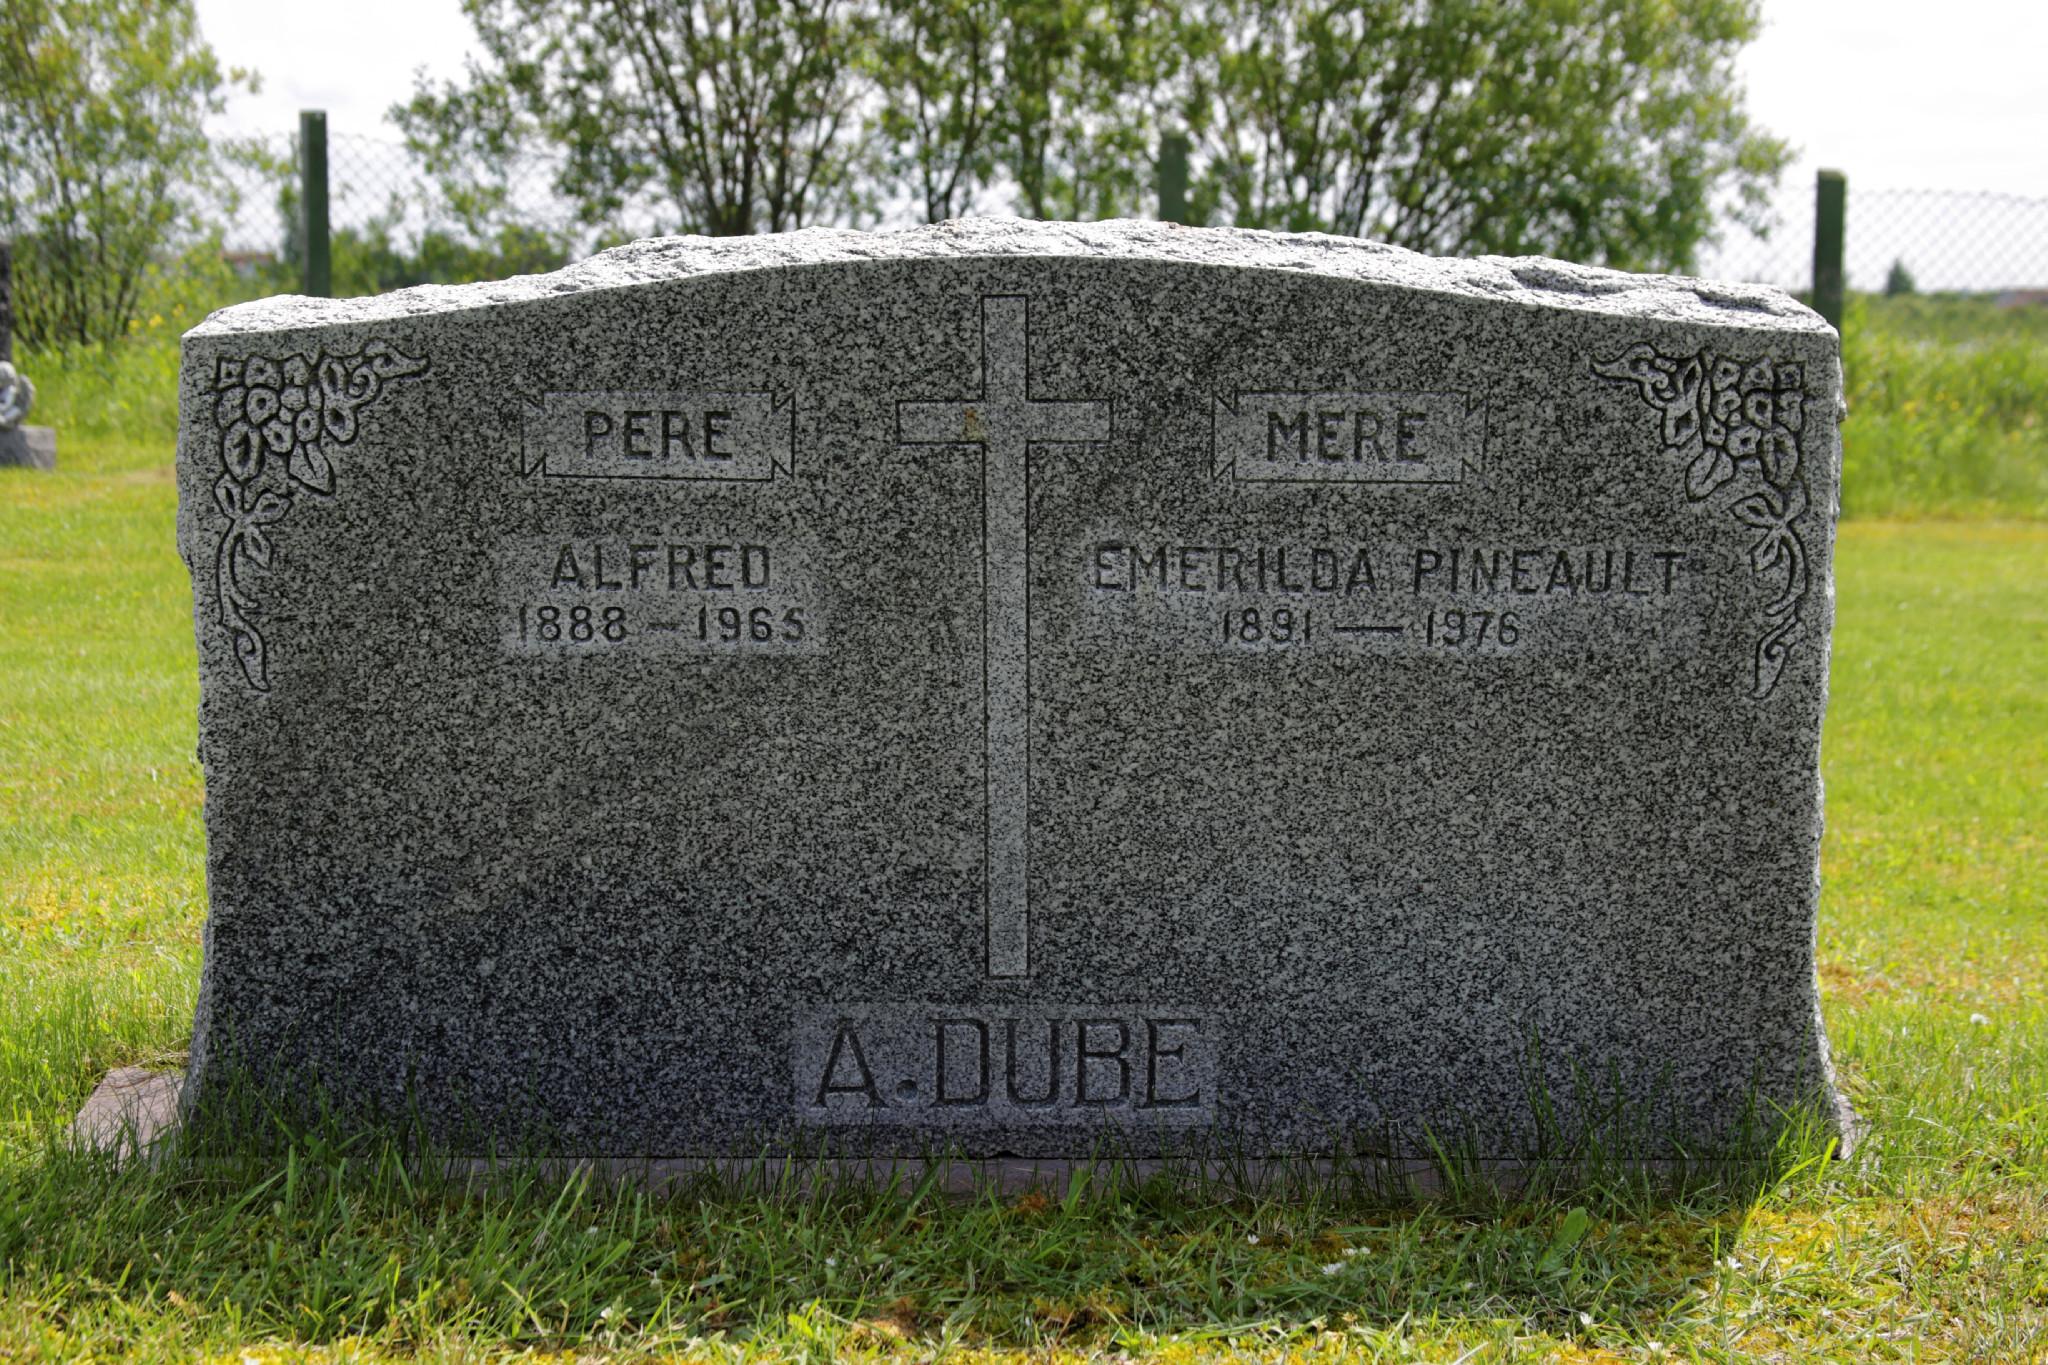 Alfred Dubé